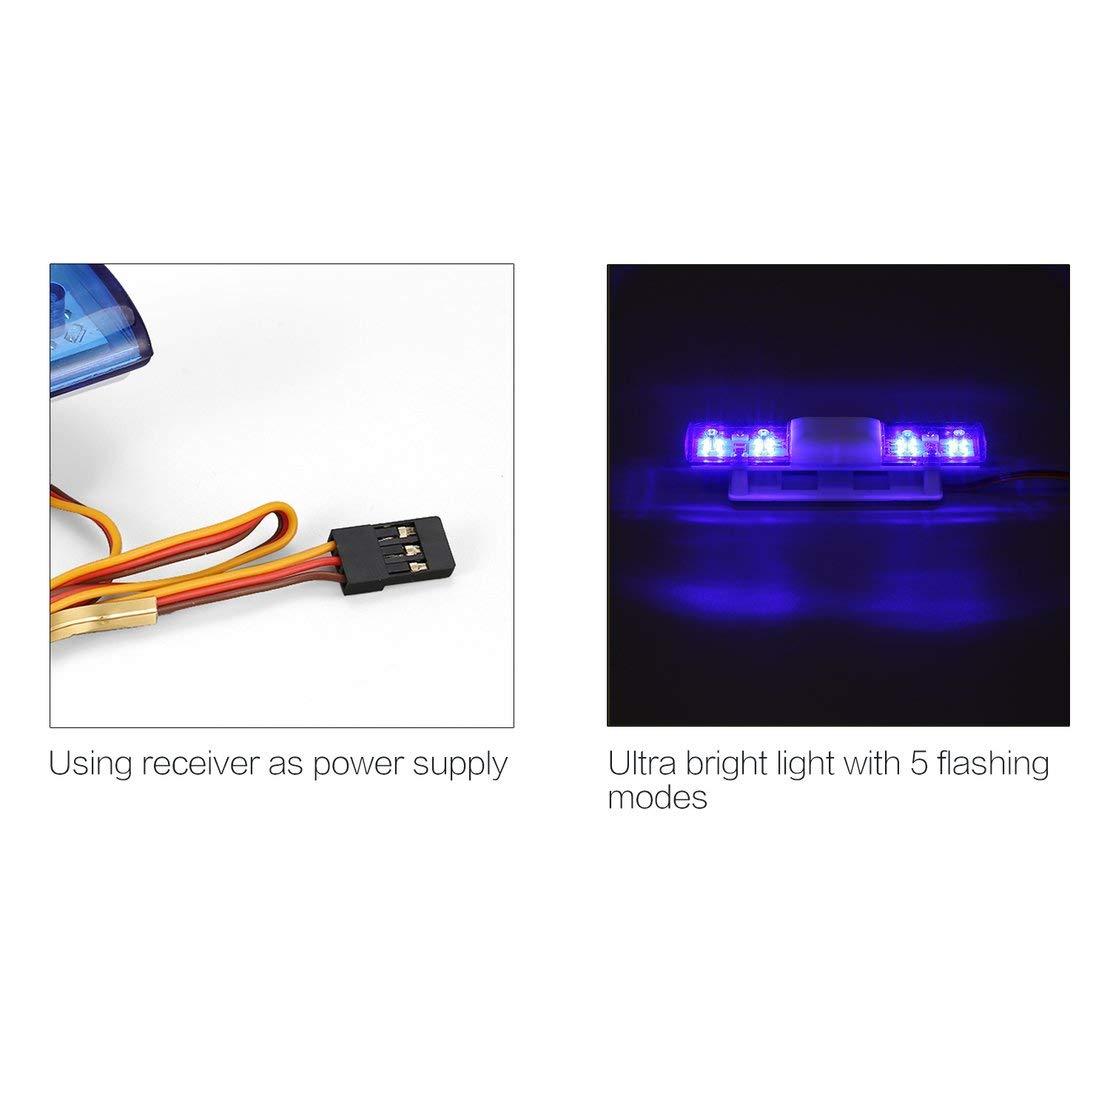 AX-501 multifunci/ón intermitente LED intermitente Polic/ía RC Luces del coche L/ámpara para 1//10 1//8 HSP Traxxas TAMIYA CC01 Axial SCX10 D90